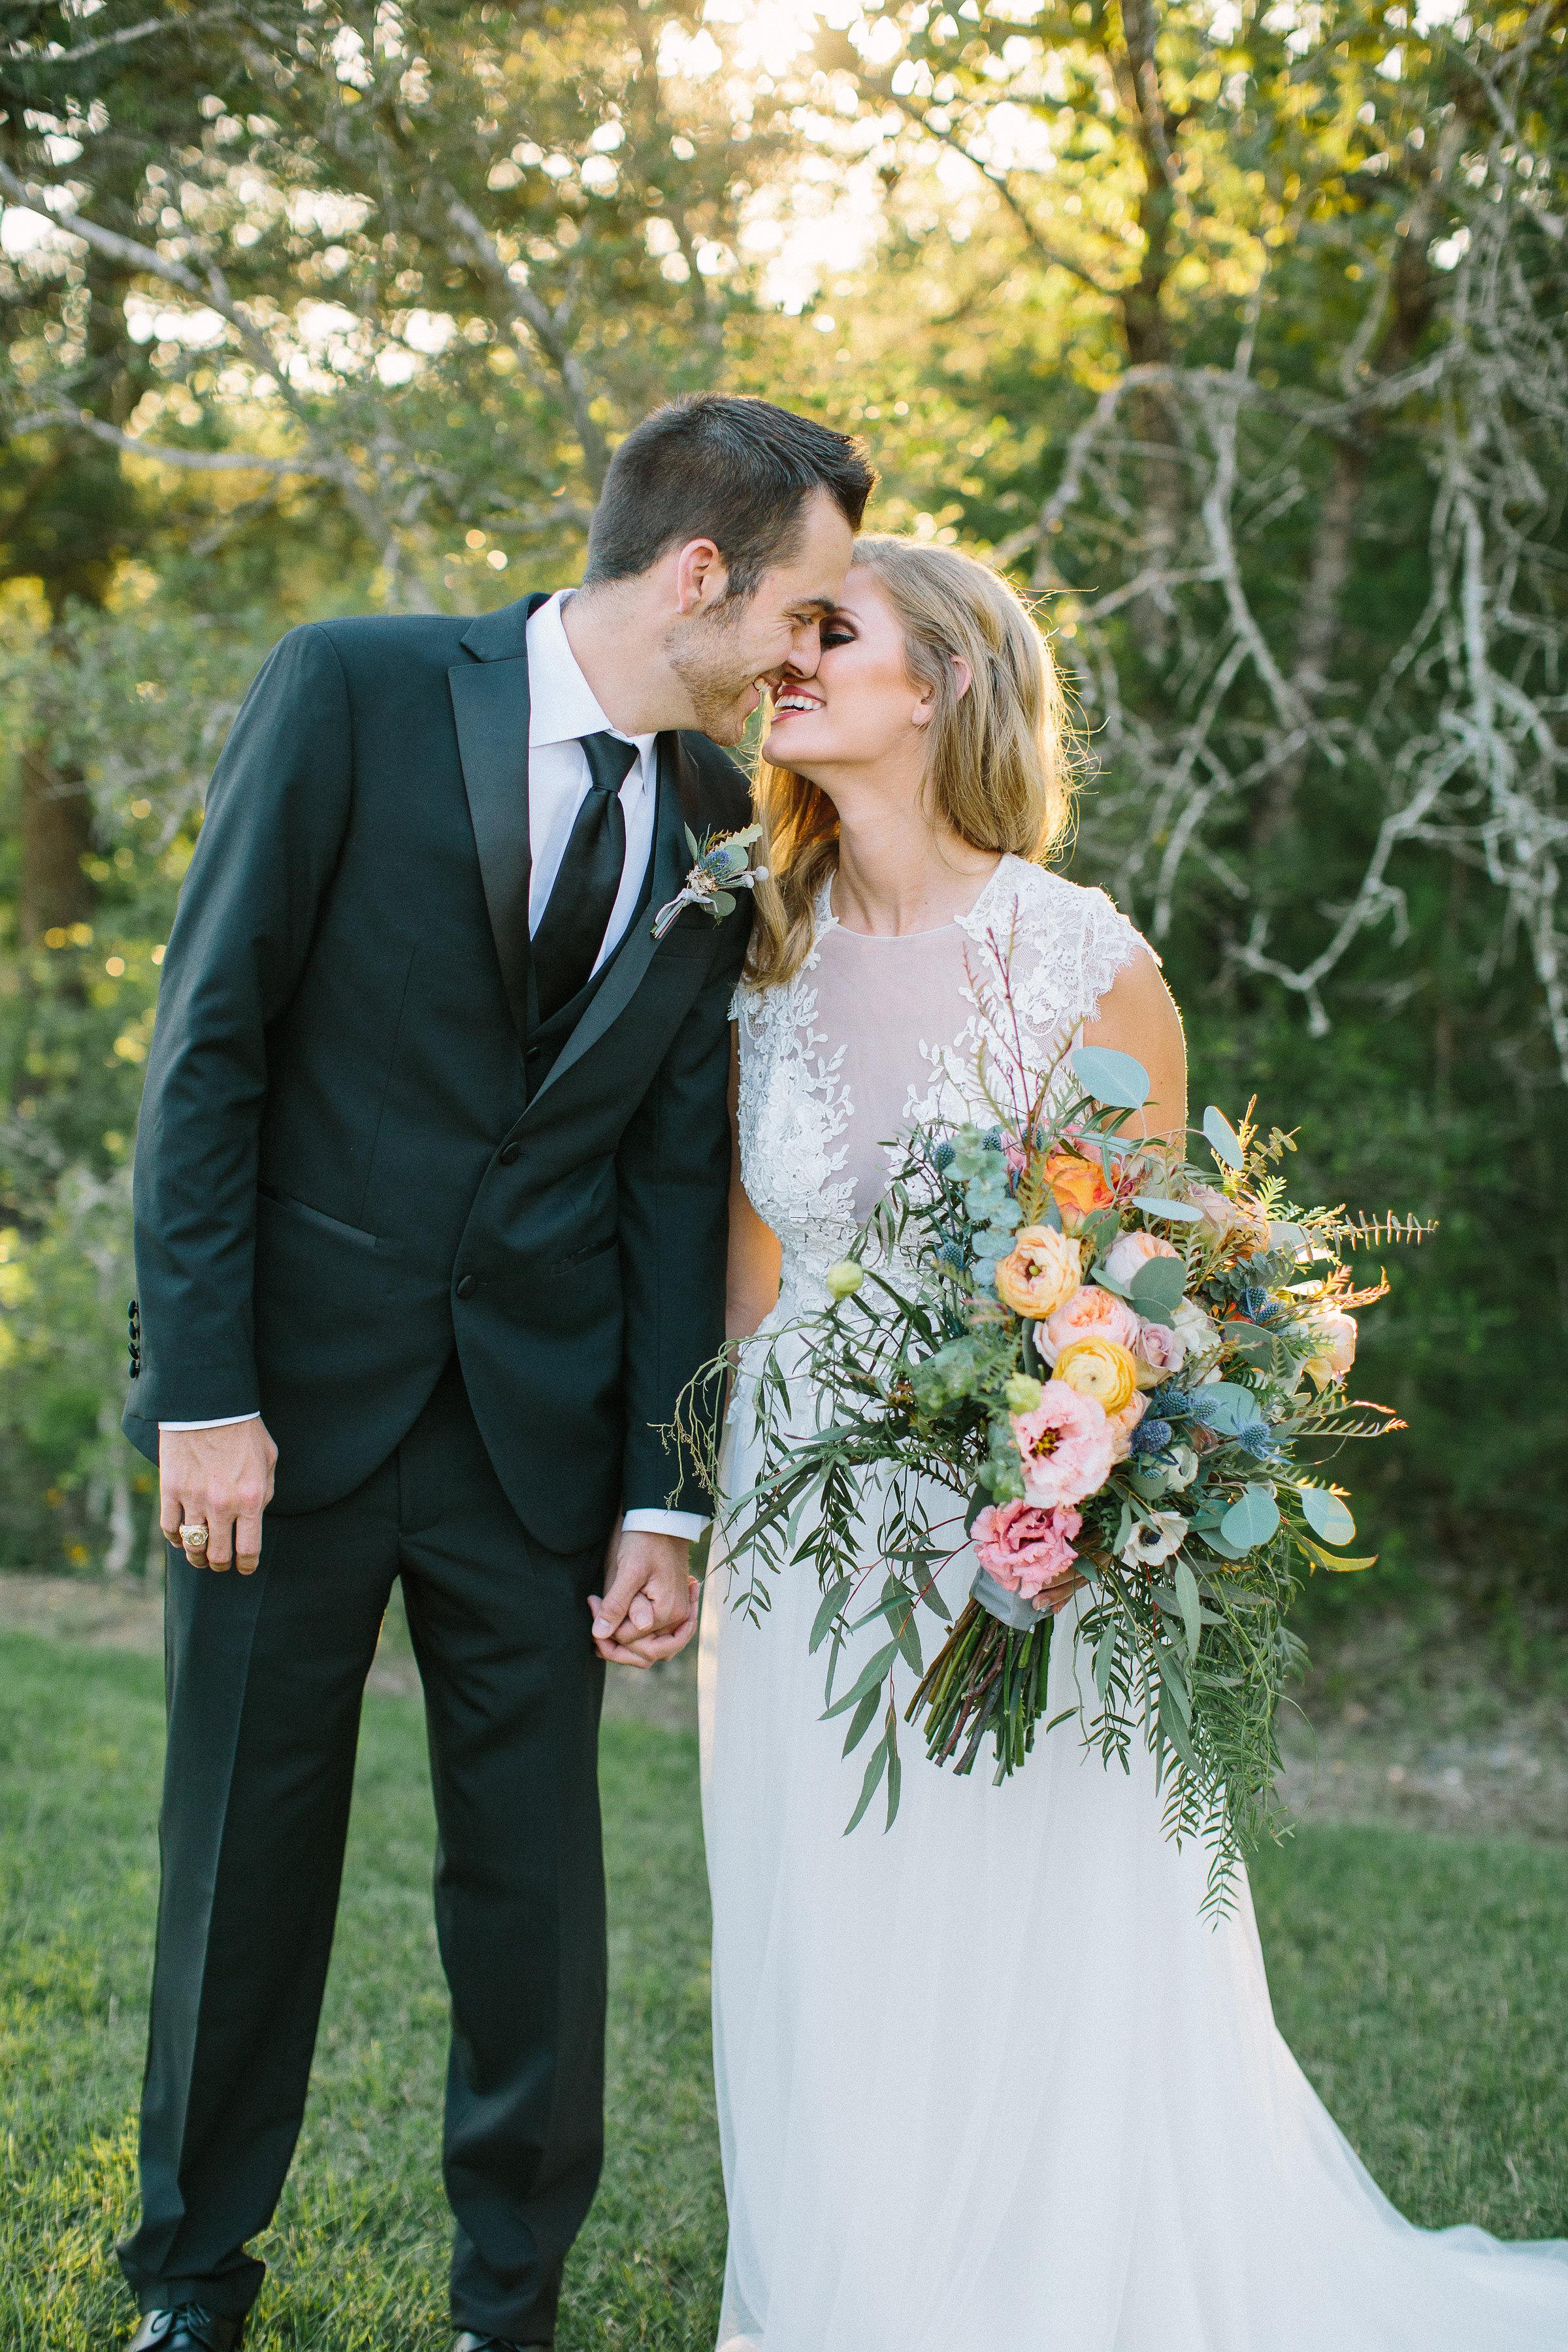 Ellen-Ashton-Photography-Peach-Creek-Ranch-Weddings-Wed-and-Prosper285